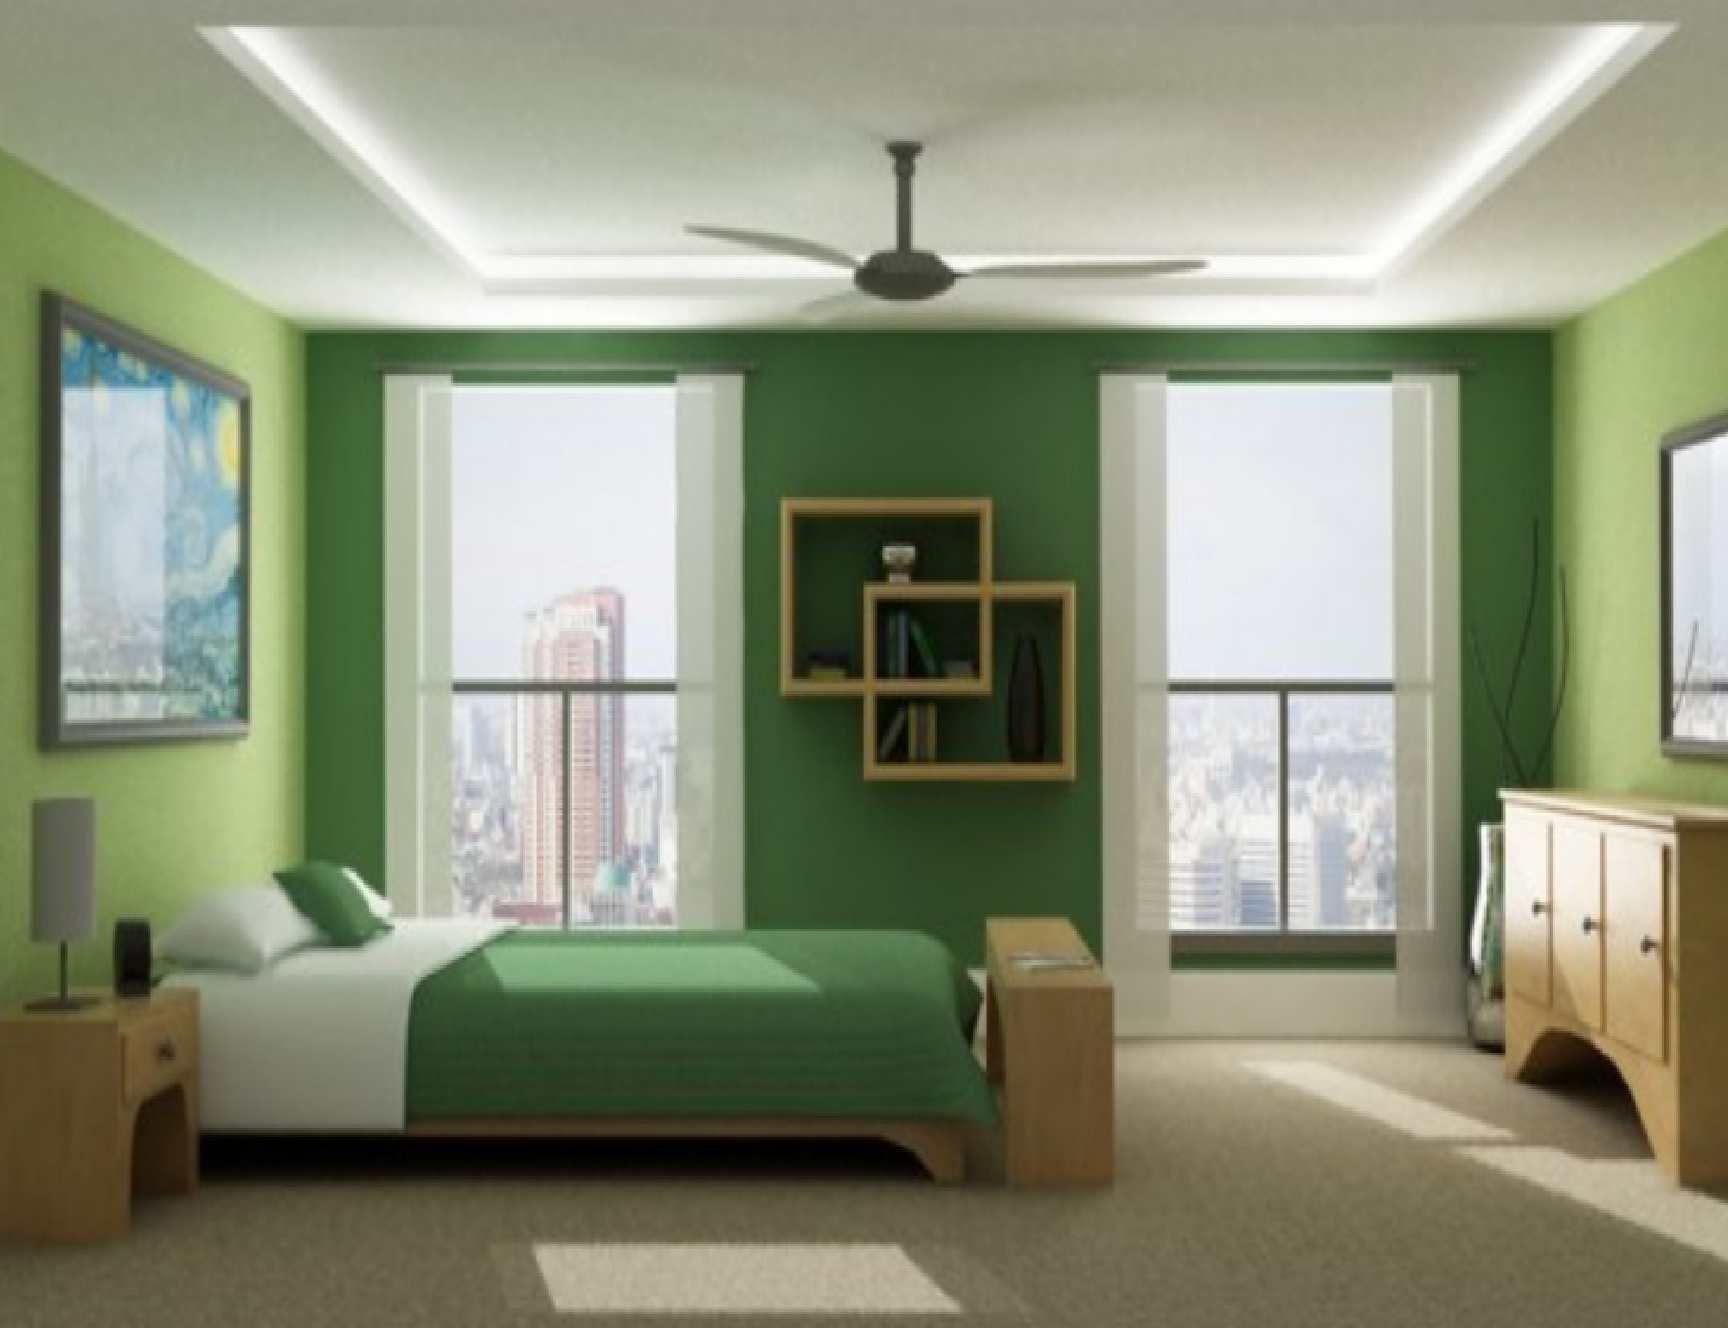 Master bedroom green paint ideas  Baby Blue Paint Green Paint Samples Best Blue Grey Paint Color